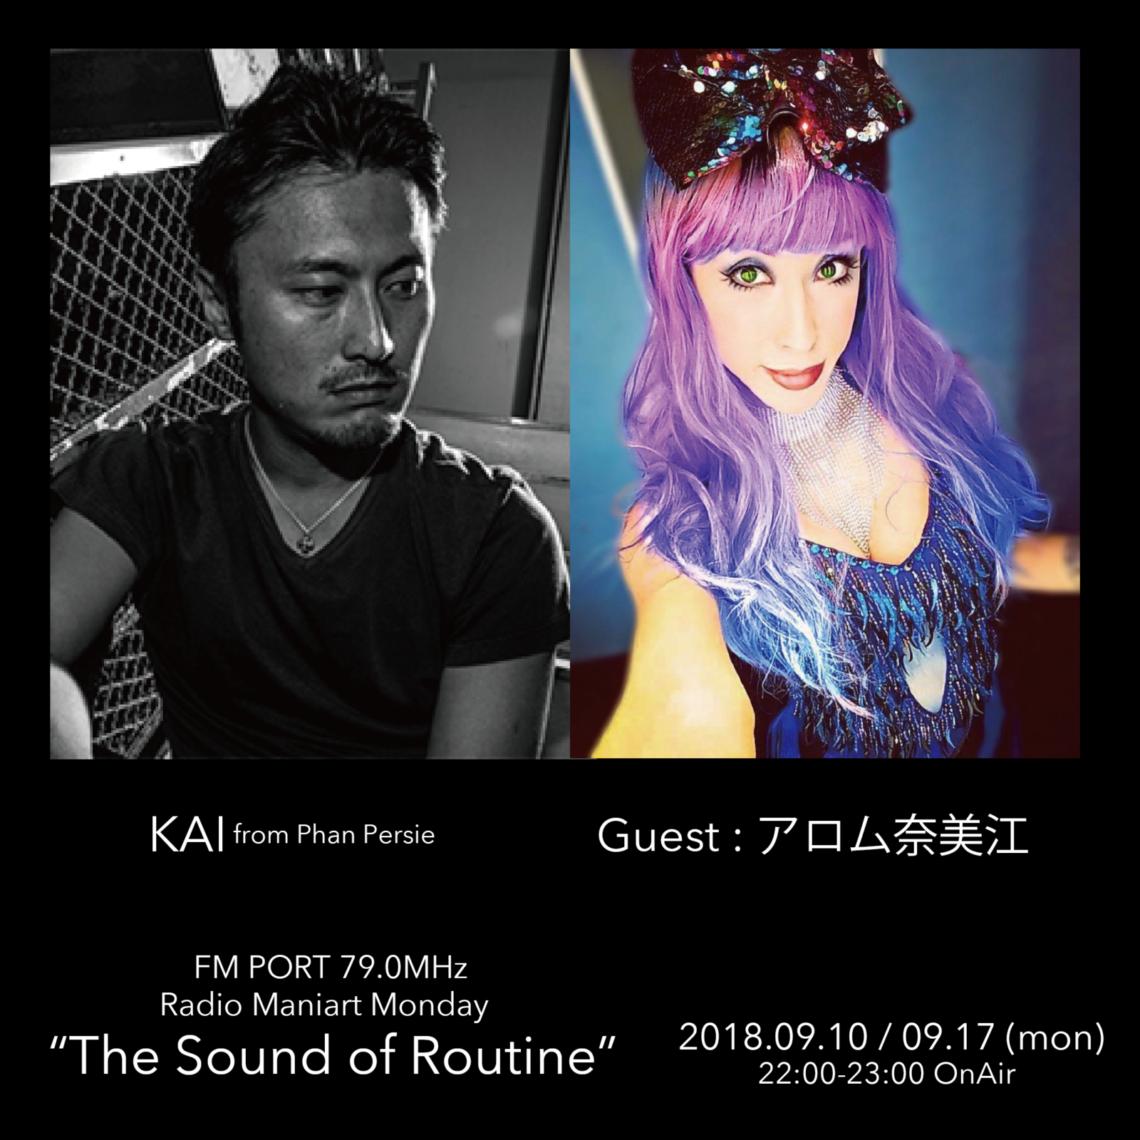 2018.9.10 MON, 9.17 MON – KAI : Navigator on FM PORT / the Sound of Routine – Guest: アロム奈美江